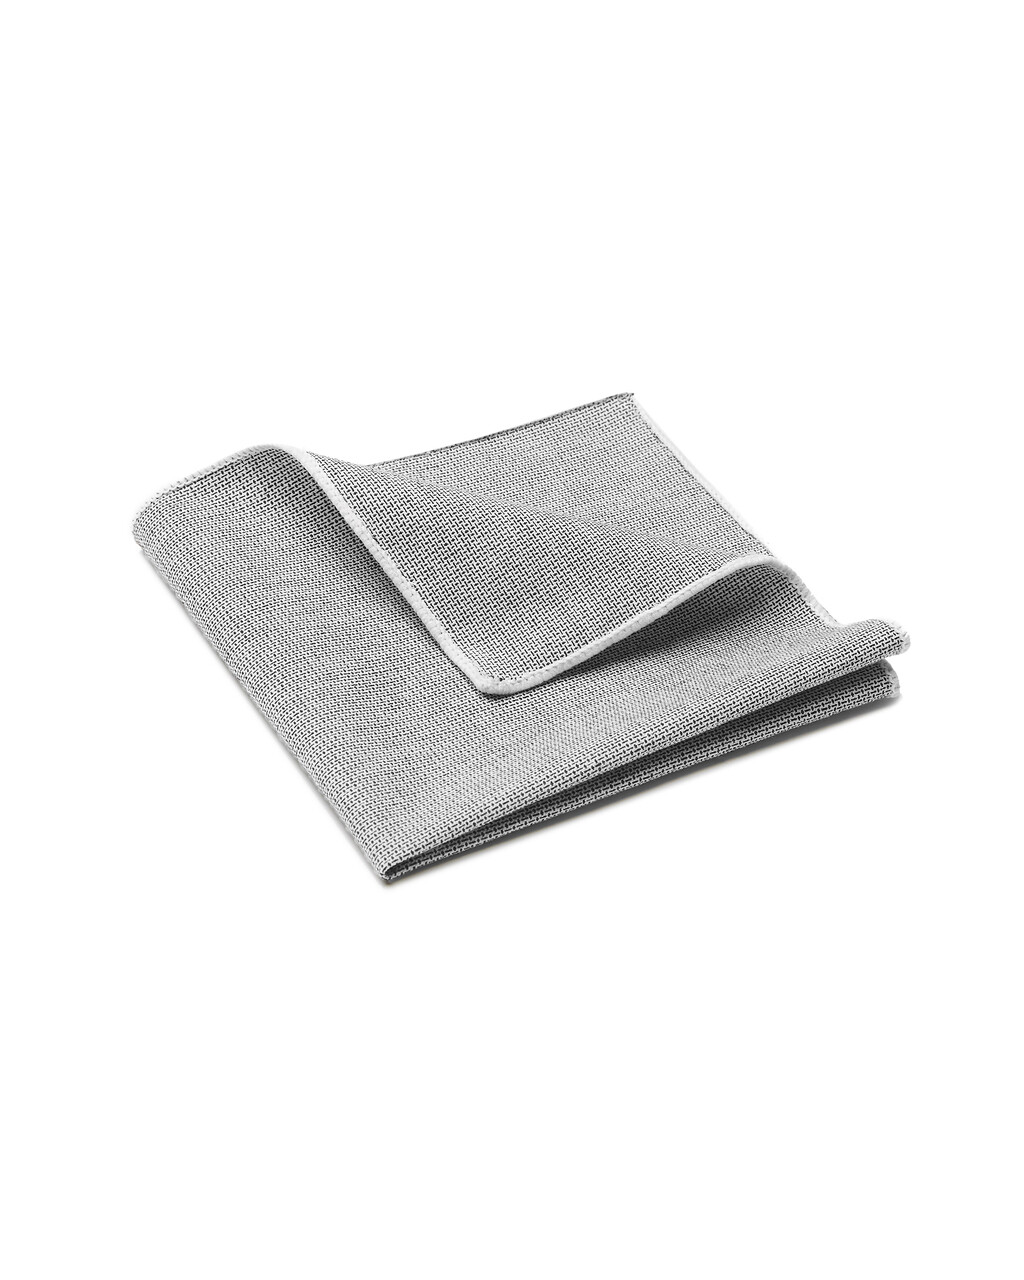 Pocket Square, Tweed, Grey